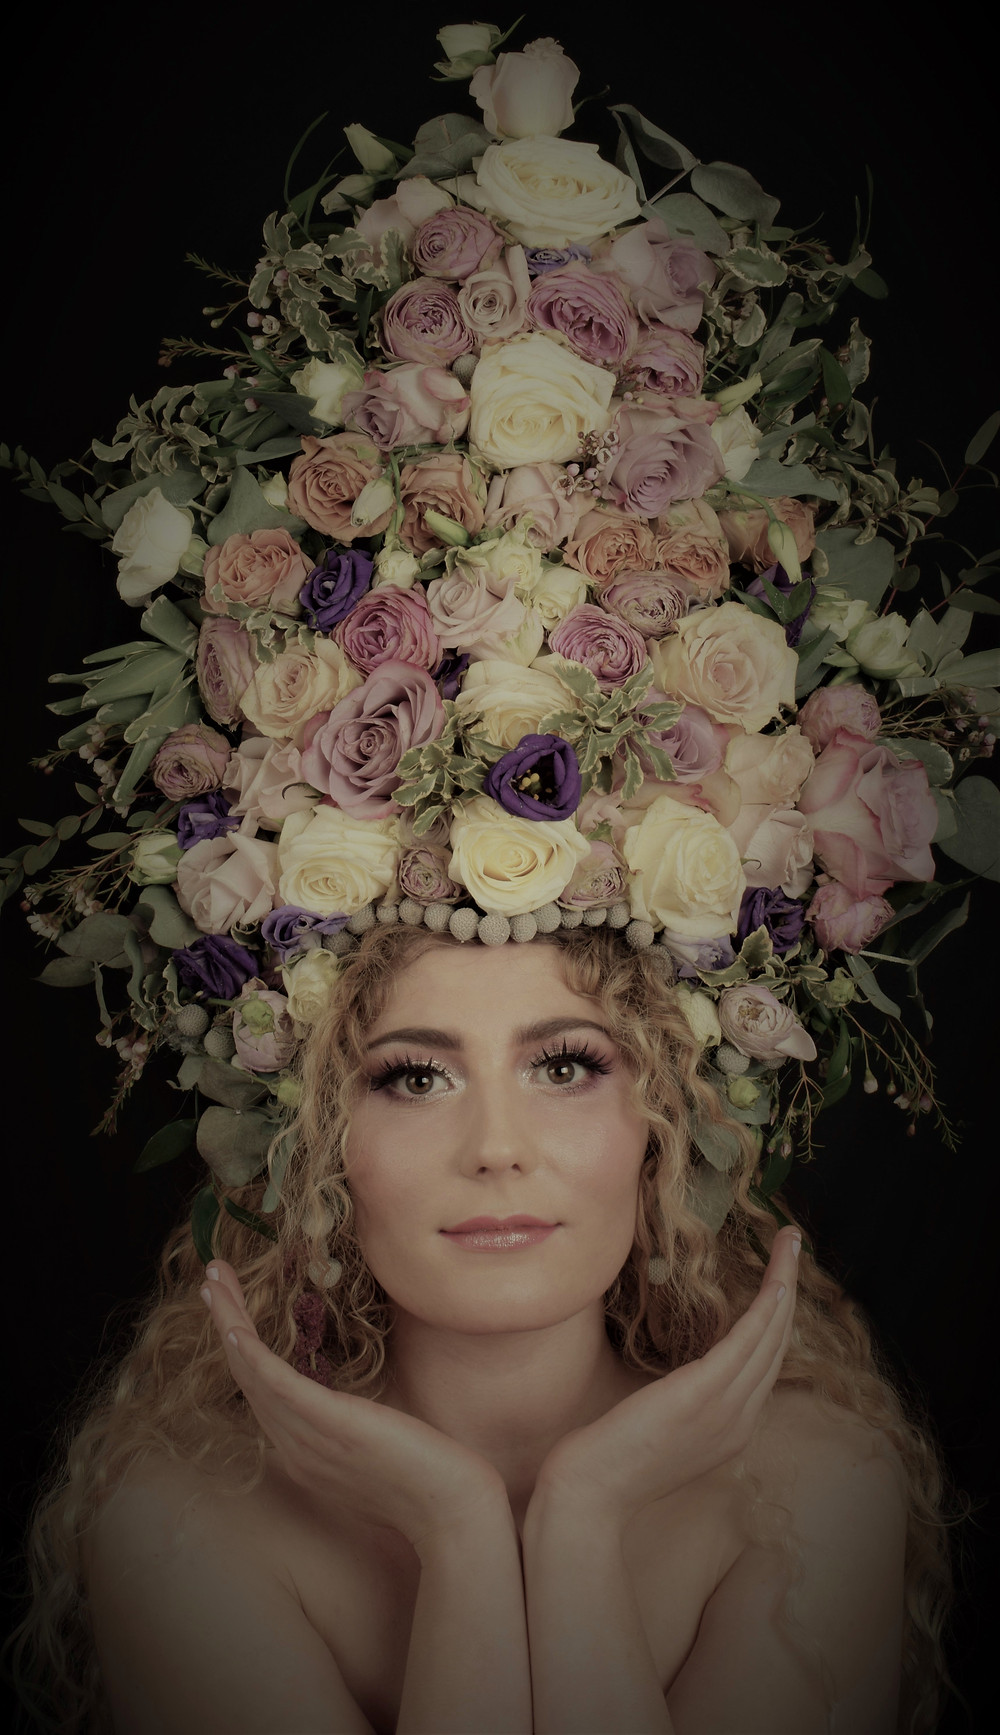 Roses Headdress by Pierangela Manzetti